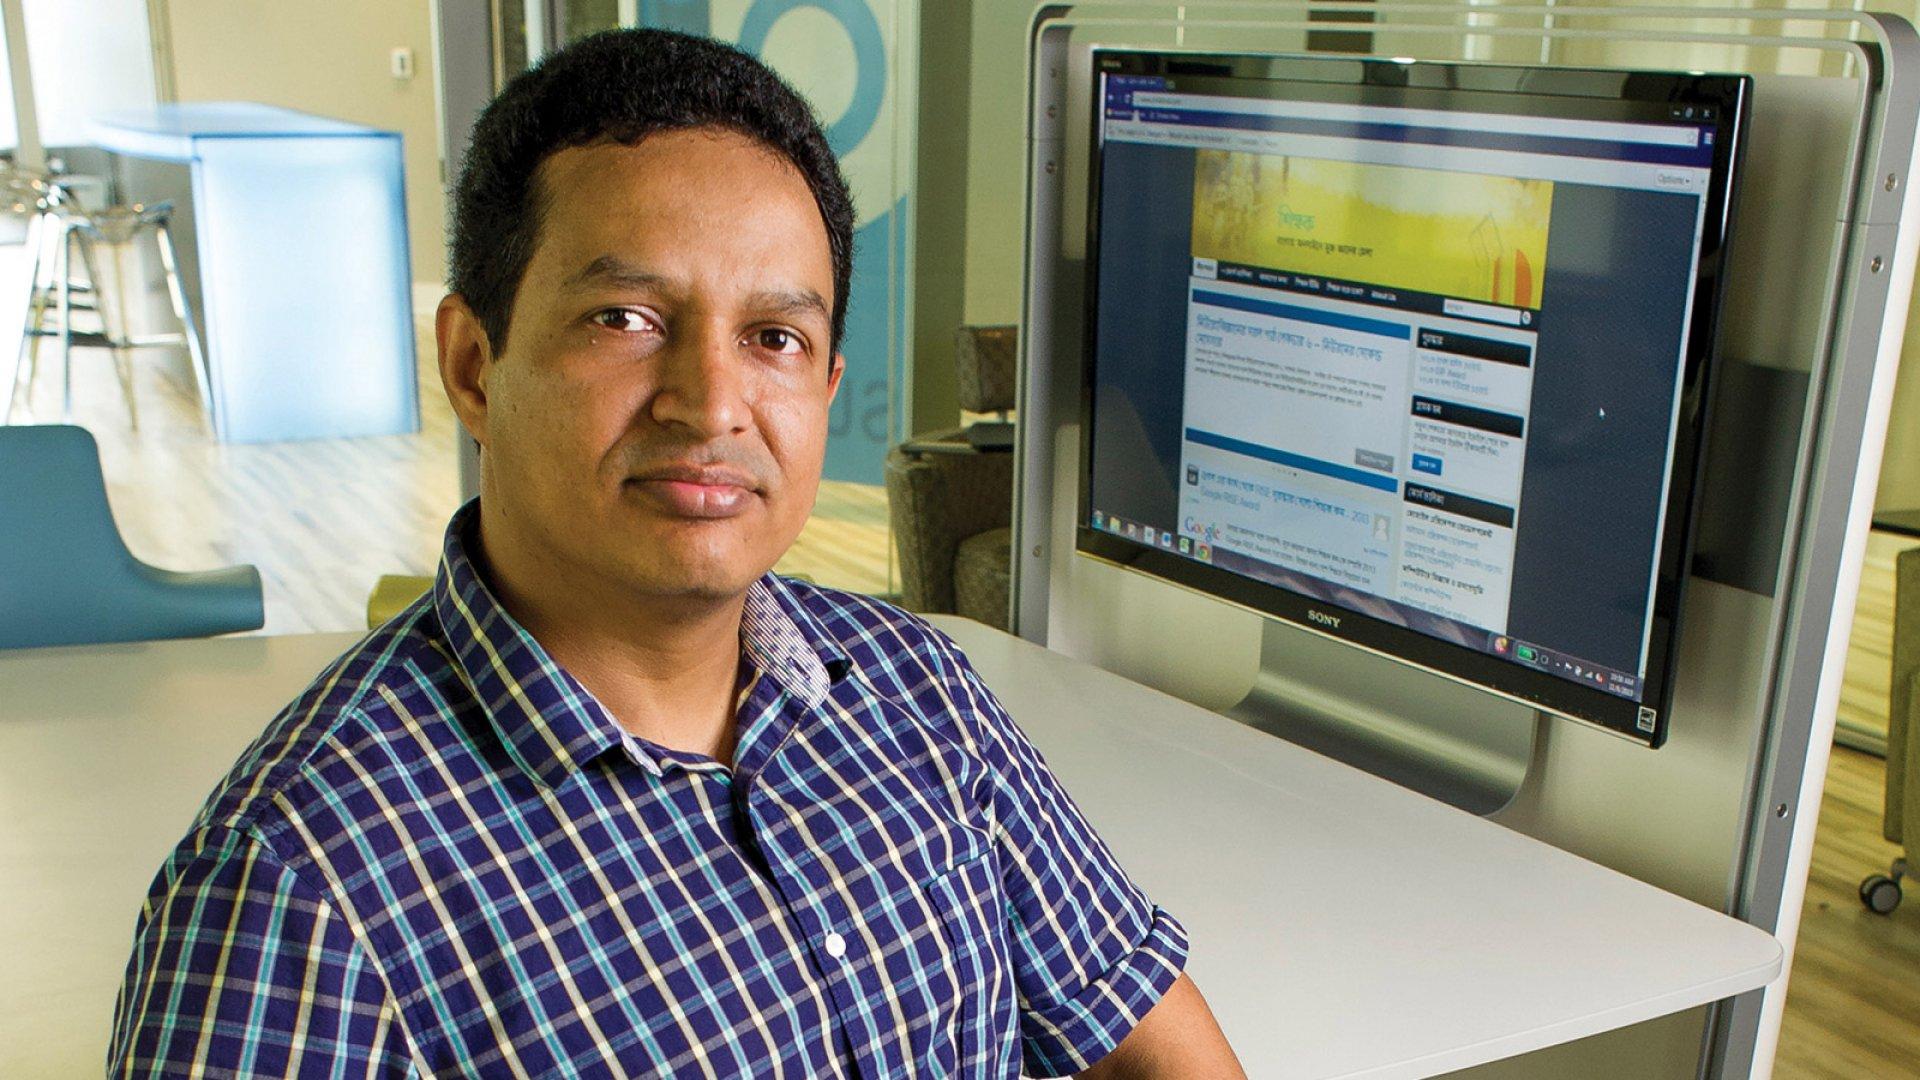 Digital Forensics: A Billion-Dollar Market in the Making